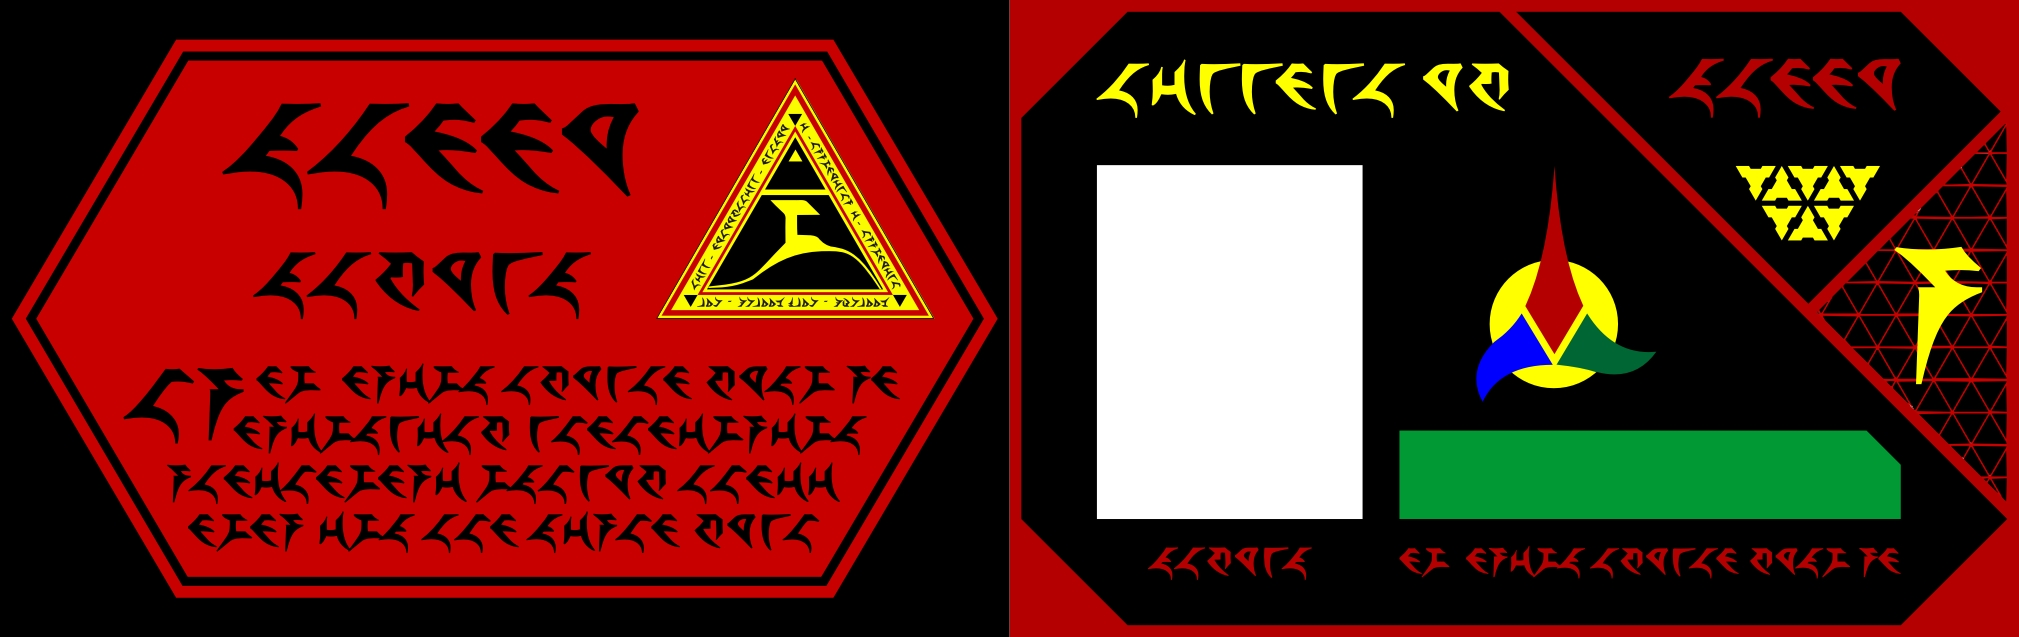 carte identité Star Trek Klingon_id_card_by_cmdrkerner-d3dk9cr